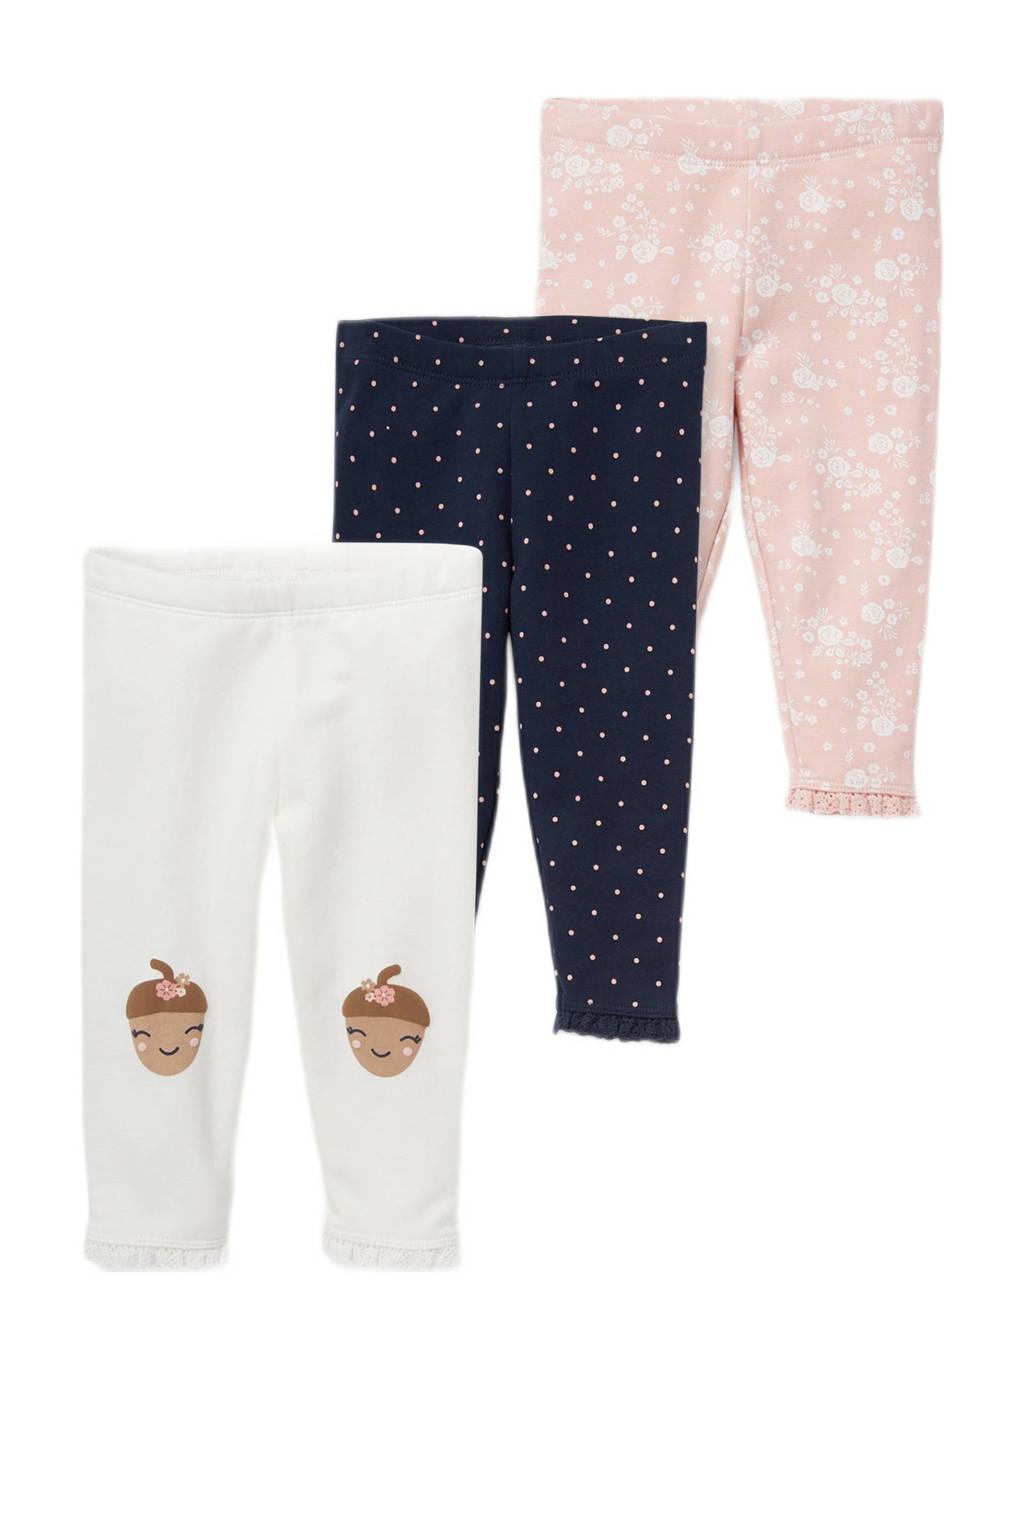 C&A legging - set van 3 wit/donkerblauw/lichtroze, Wit/donkerblauw/lichtroze